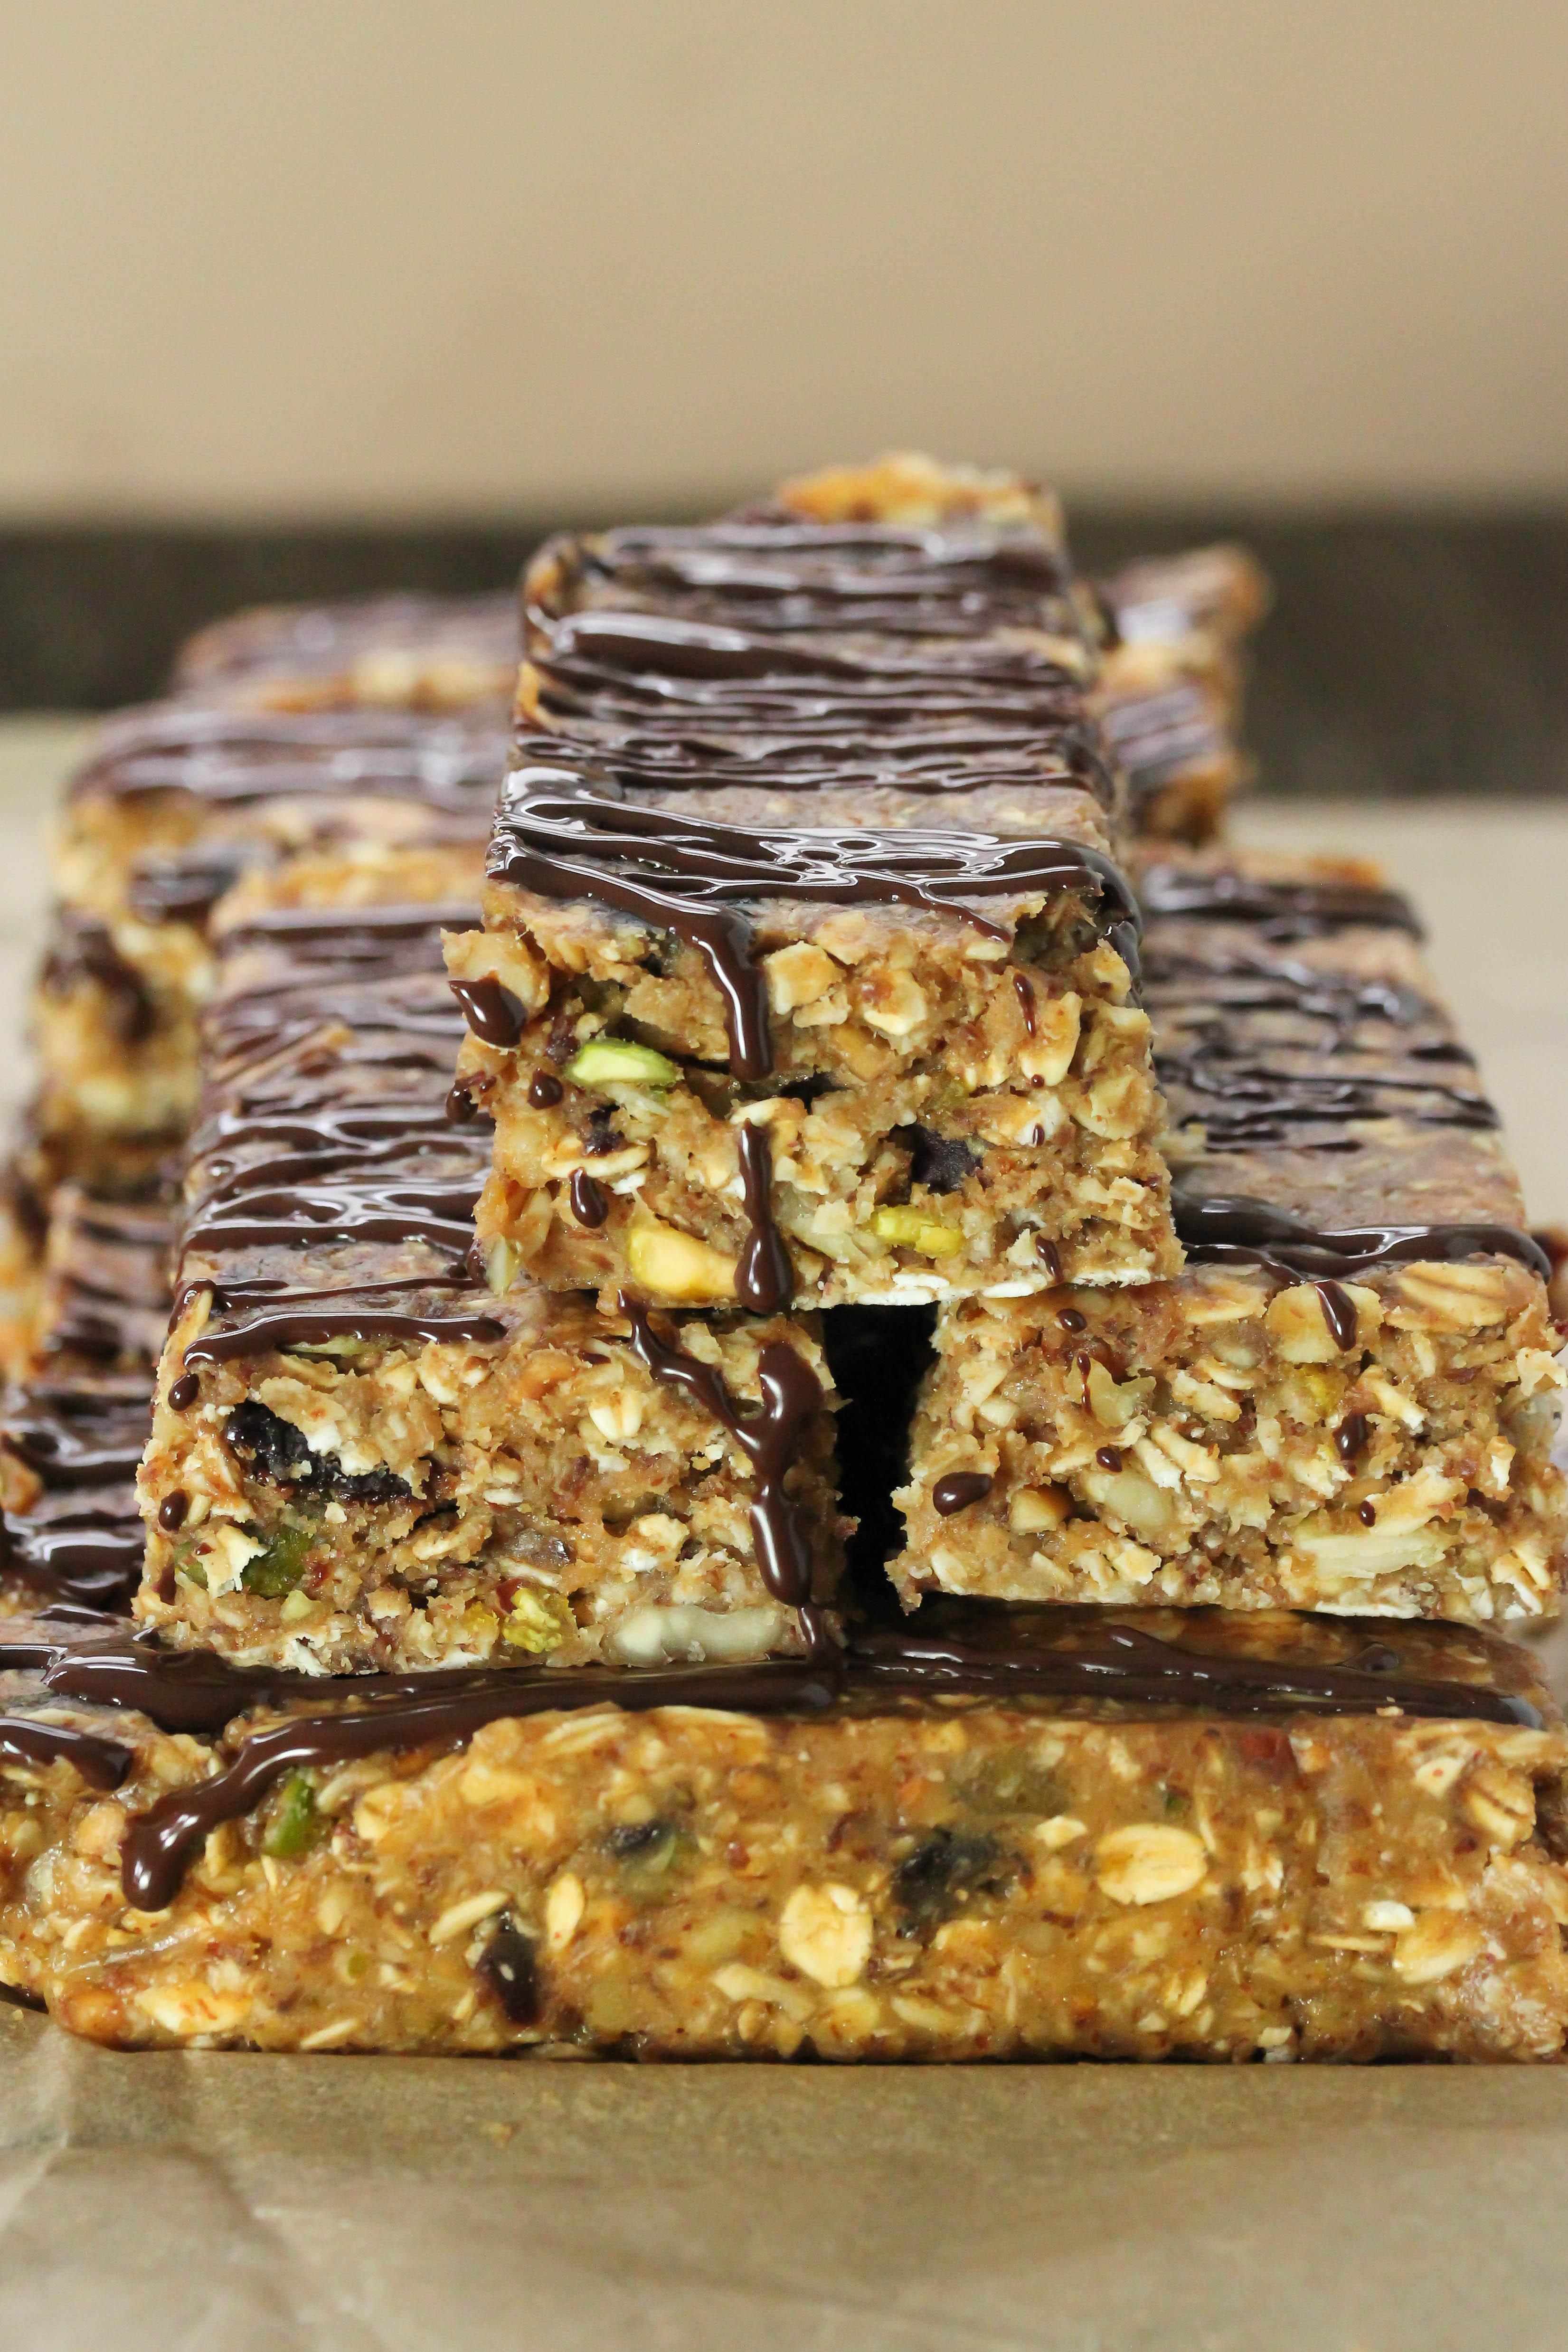 Healthy Breakfast Bar  No bake breakfast bars Gluten free vegan